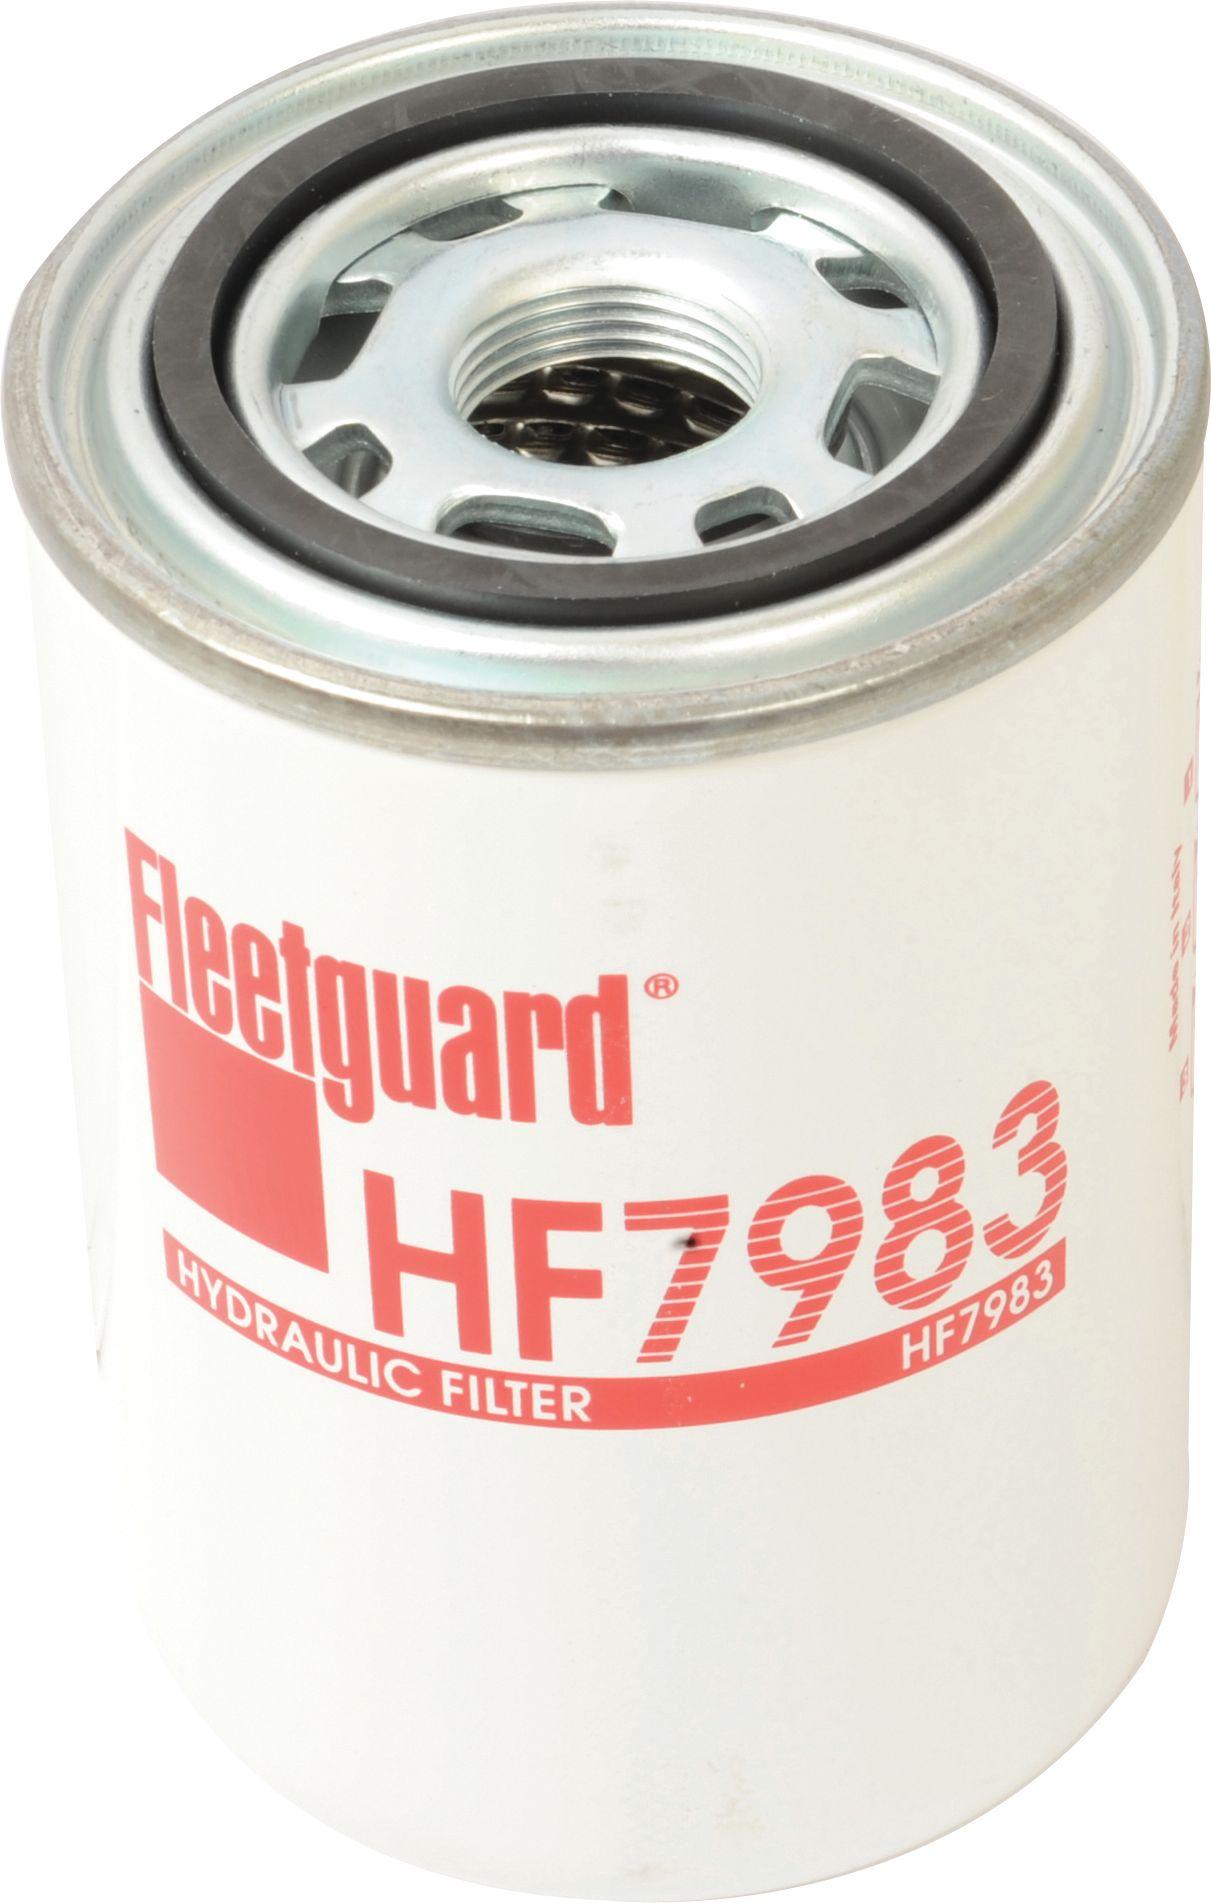 JCB HYDRAULIC FILTER HF7983 109372